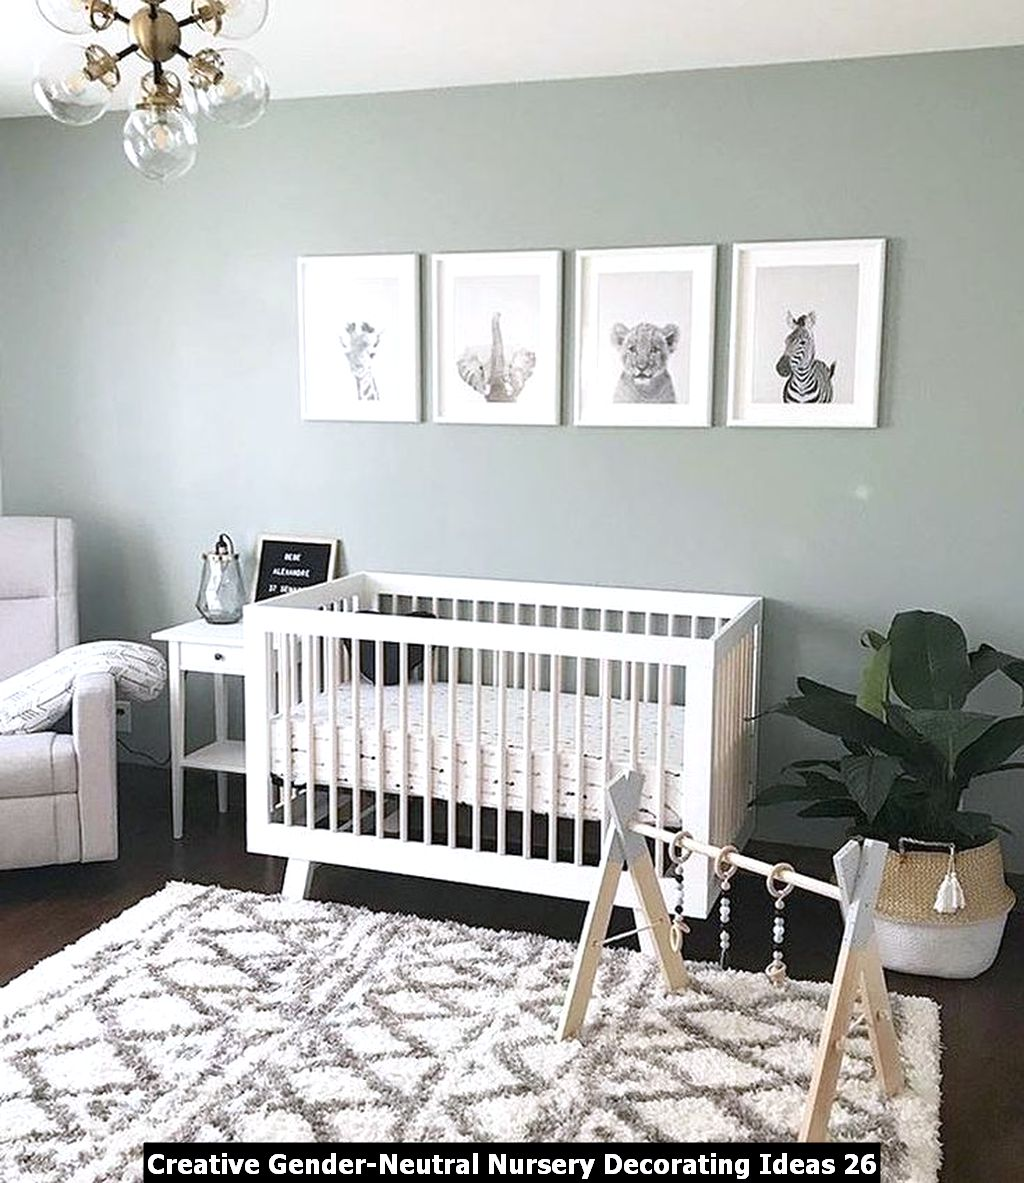 Creative Gender Neutral Nursery Decorating Ideas 26